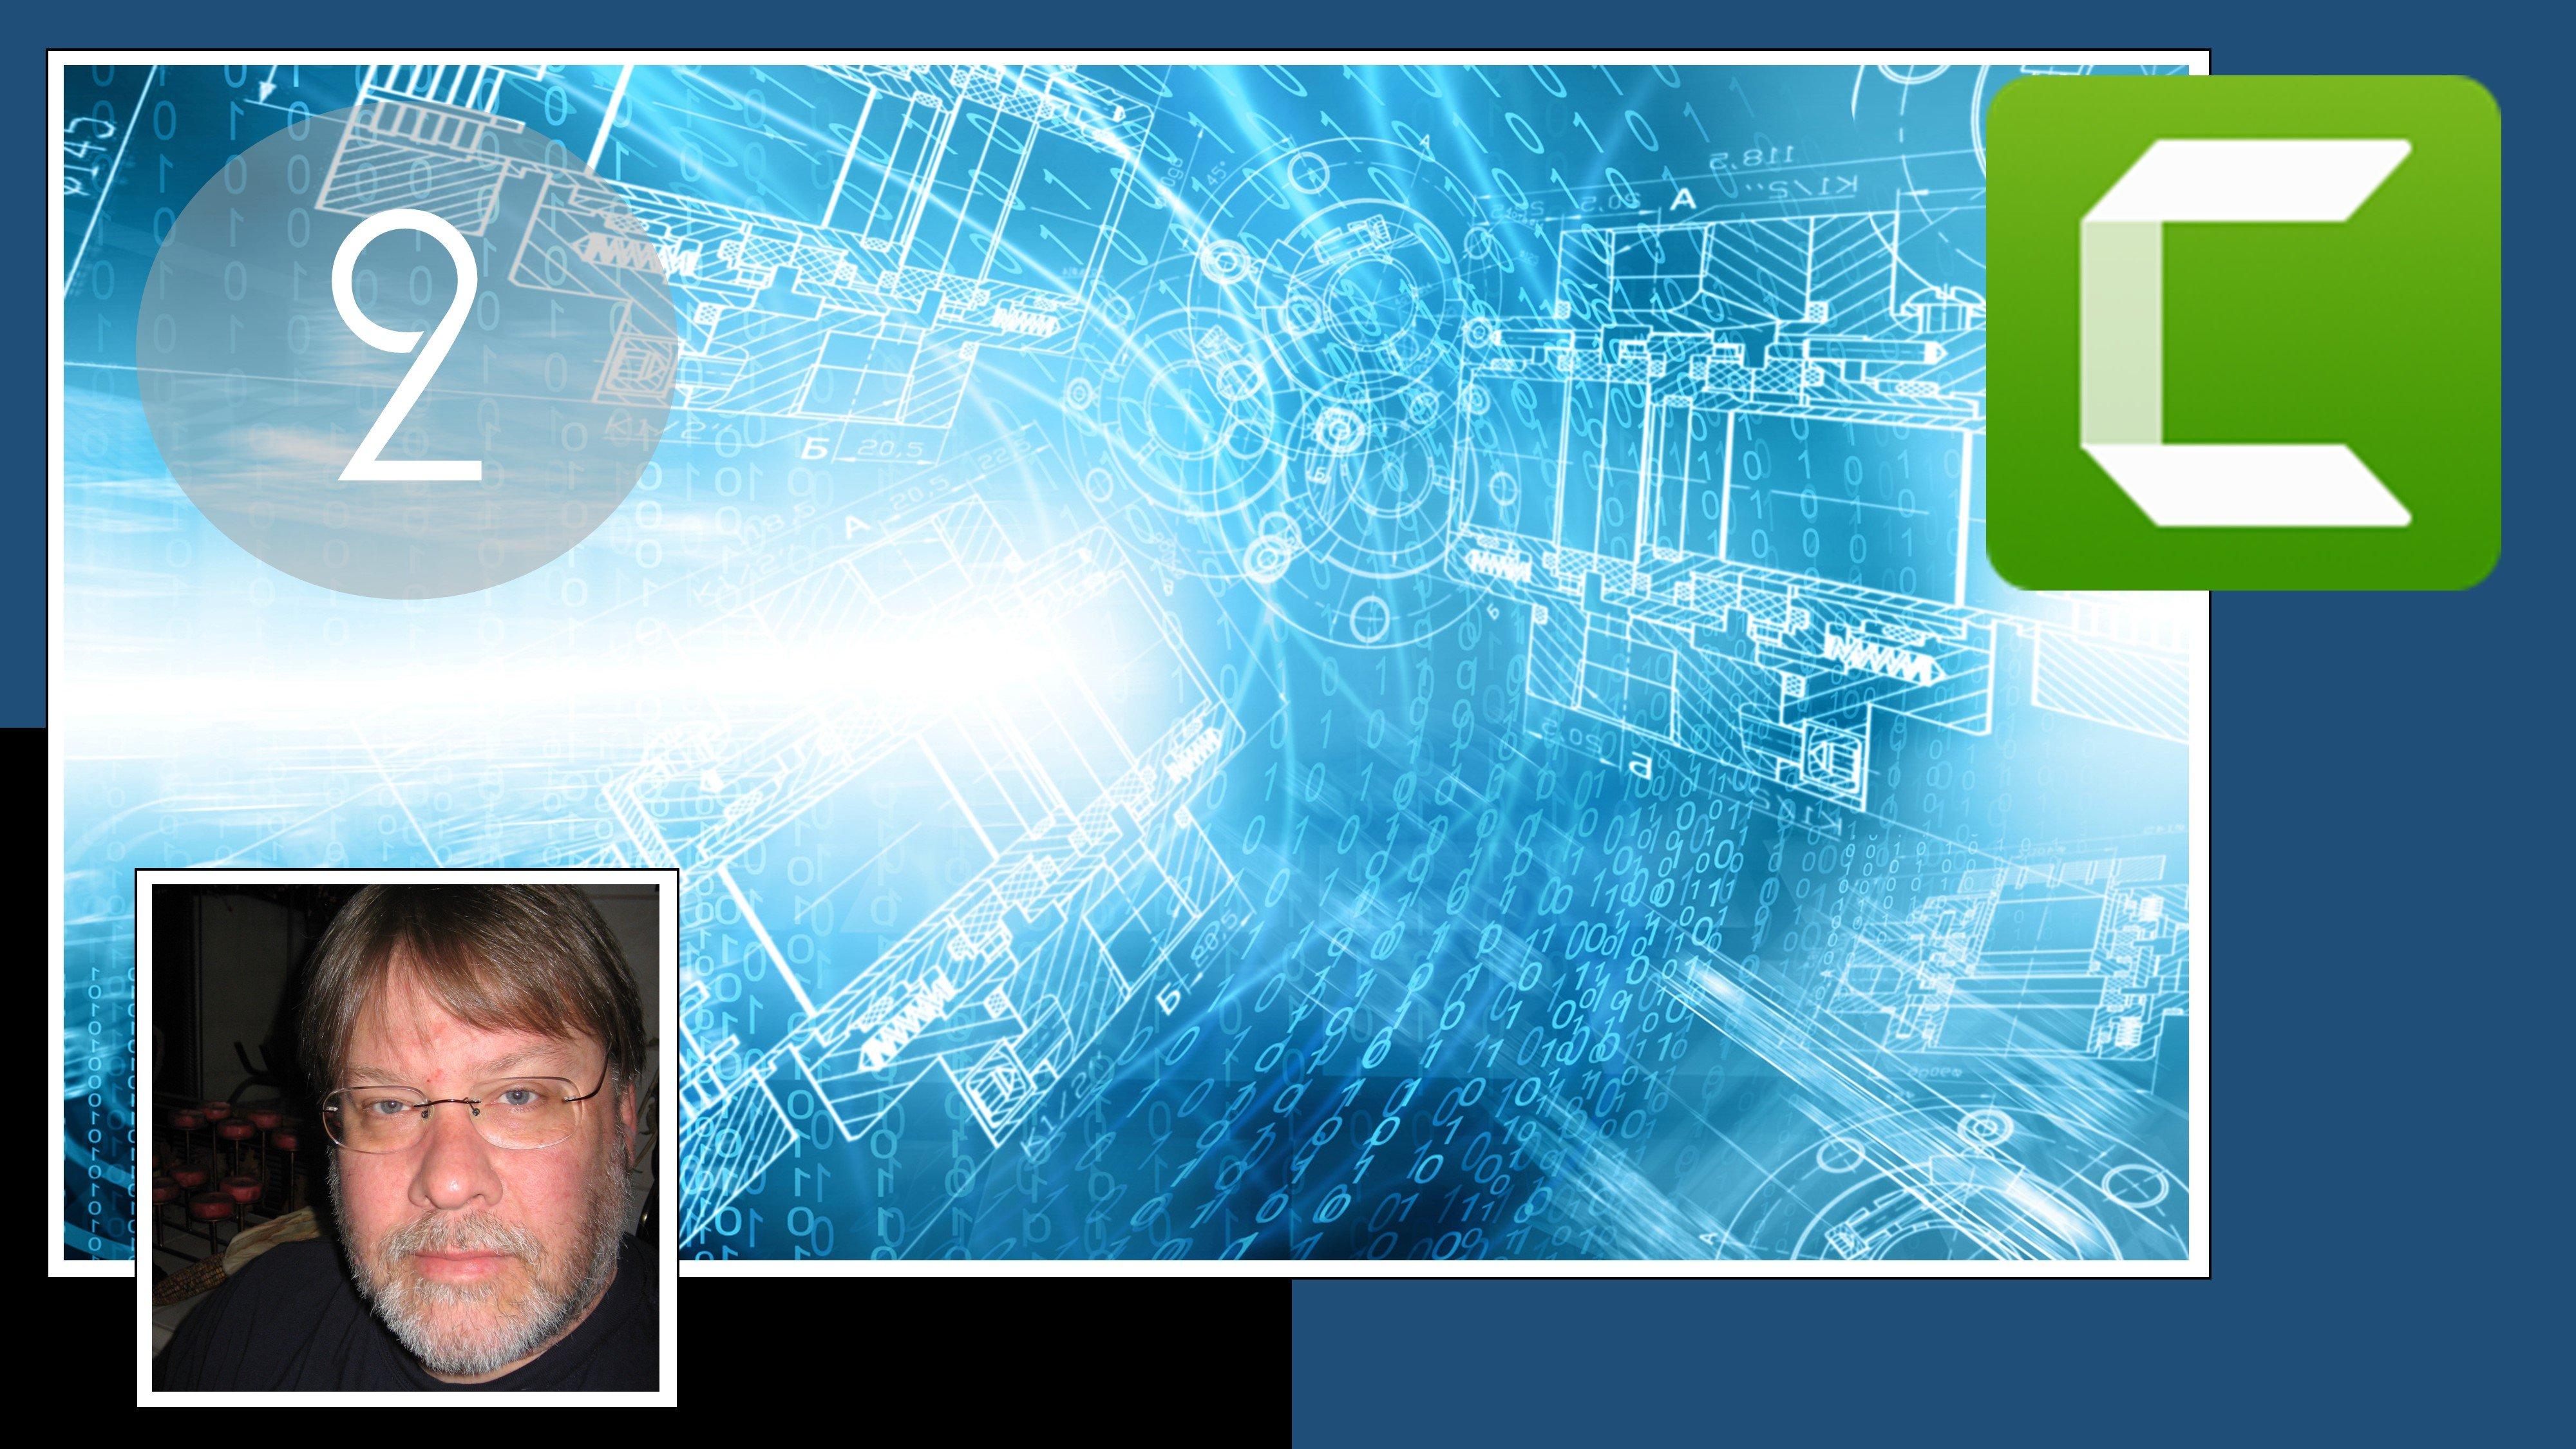 Camtasia Studio with Microsoft PowerPoint 2: PowerPoint